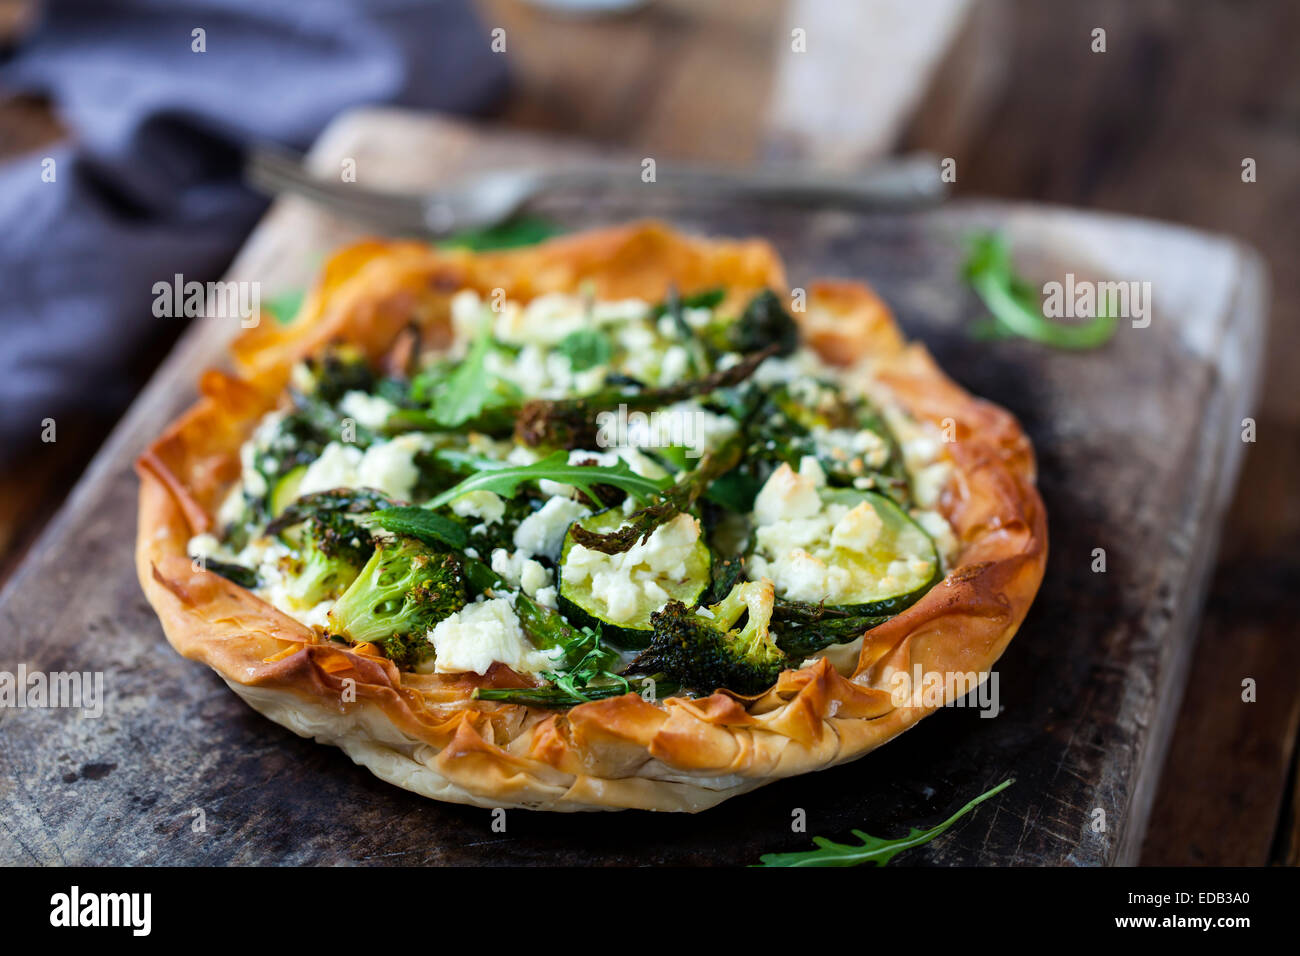 Pâte filo tourte aux légumes verts rôti Photo Stock